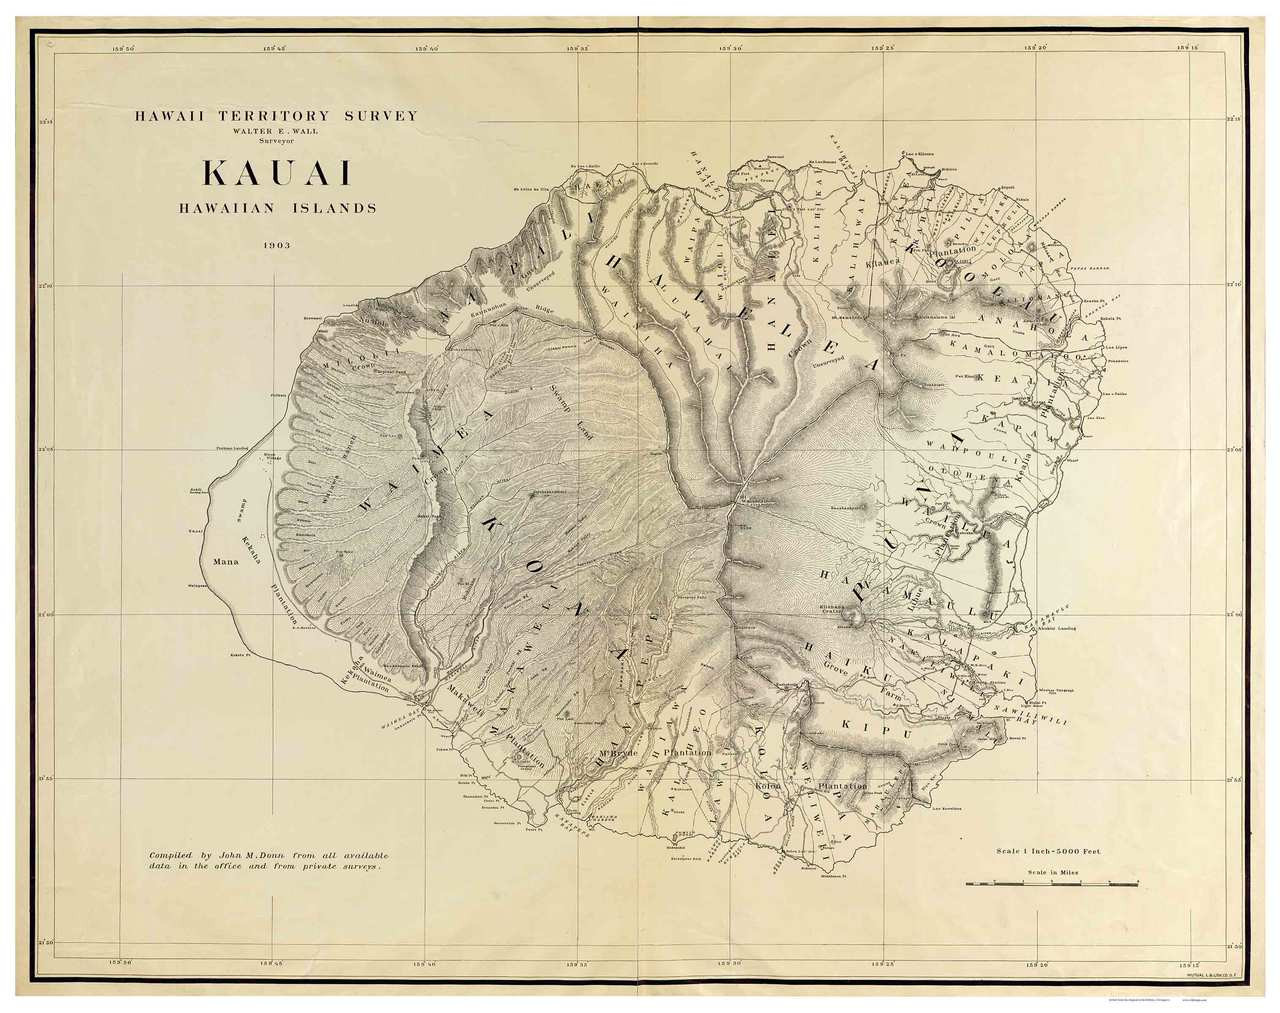 Island of Kauai - Hawaii 1903 Old Map Reprint on maui map, poipu map, hawaiian map, molokai map, hanauma bay map, kapalua bay beach map, hanalei beach map, tetiaroa map, hawaii map, lanai map, honolulu map, na pali coast map, hilo map, waimea canyon map, necker island map, oahu map, anini beach map, lihue map, niihau map, big island map,